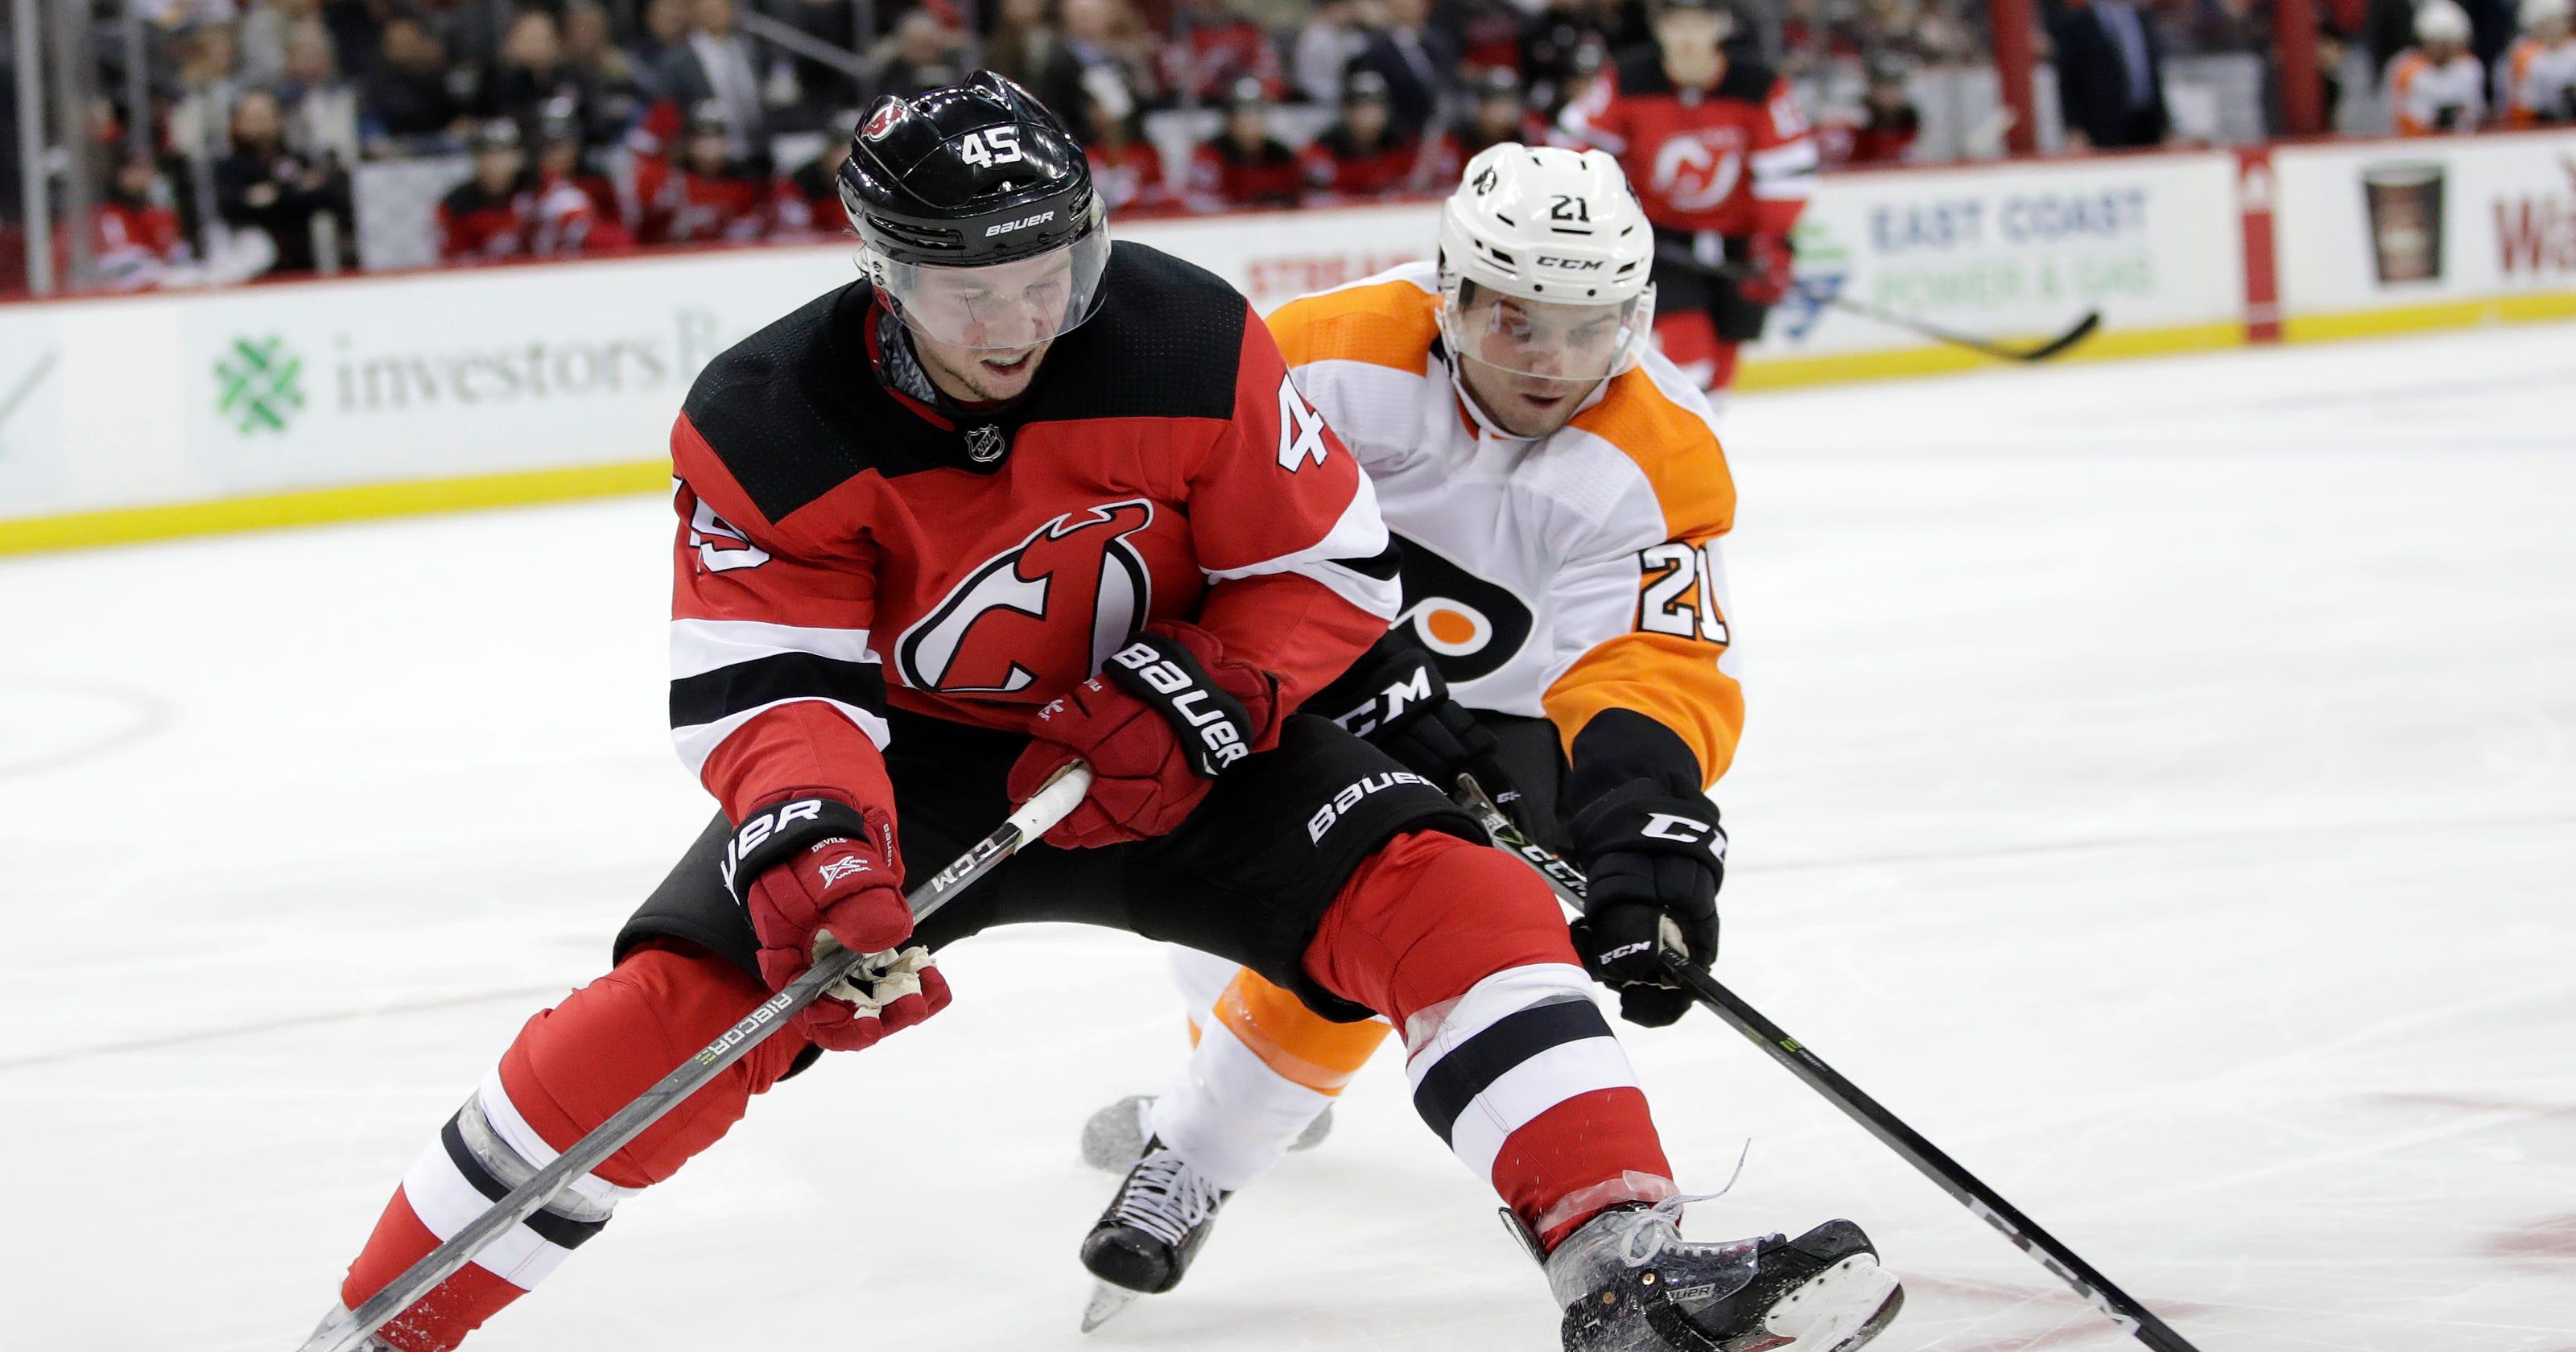 456e4856d NJ Devils Live Blog  Devils rally for 4-3 win over Flyers